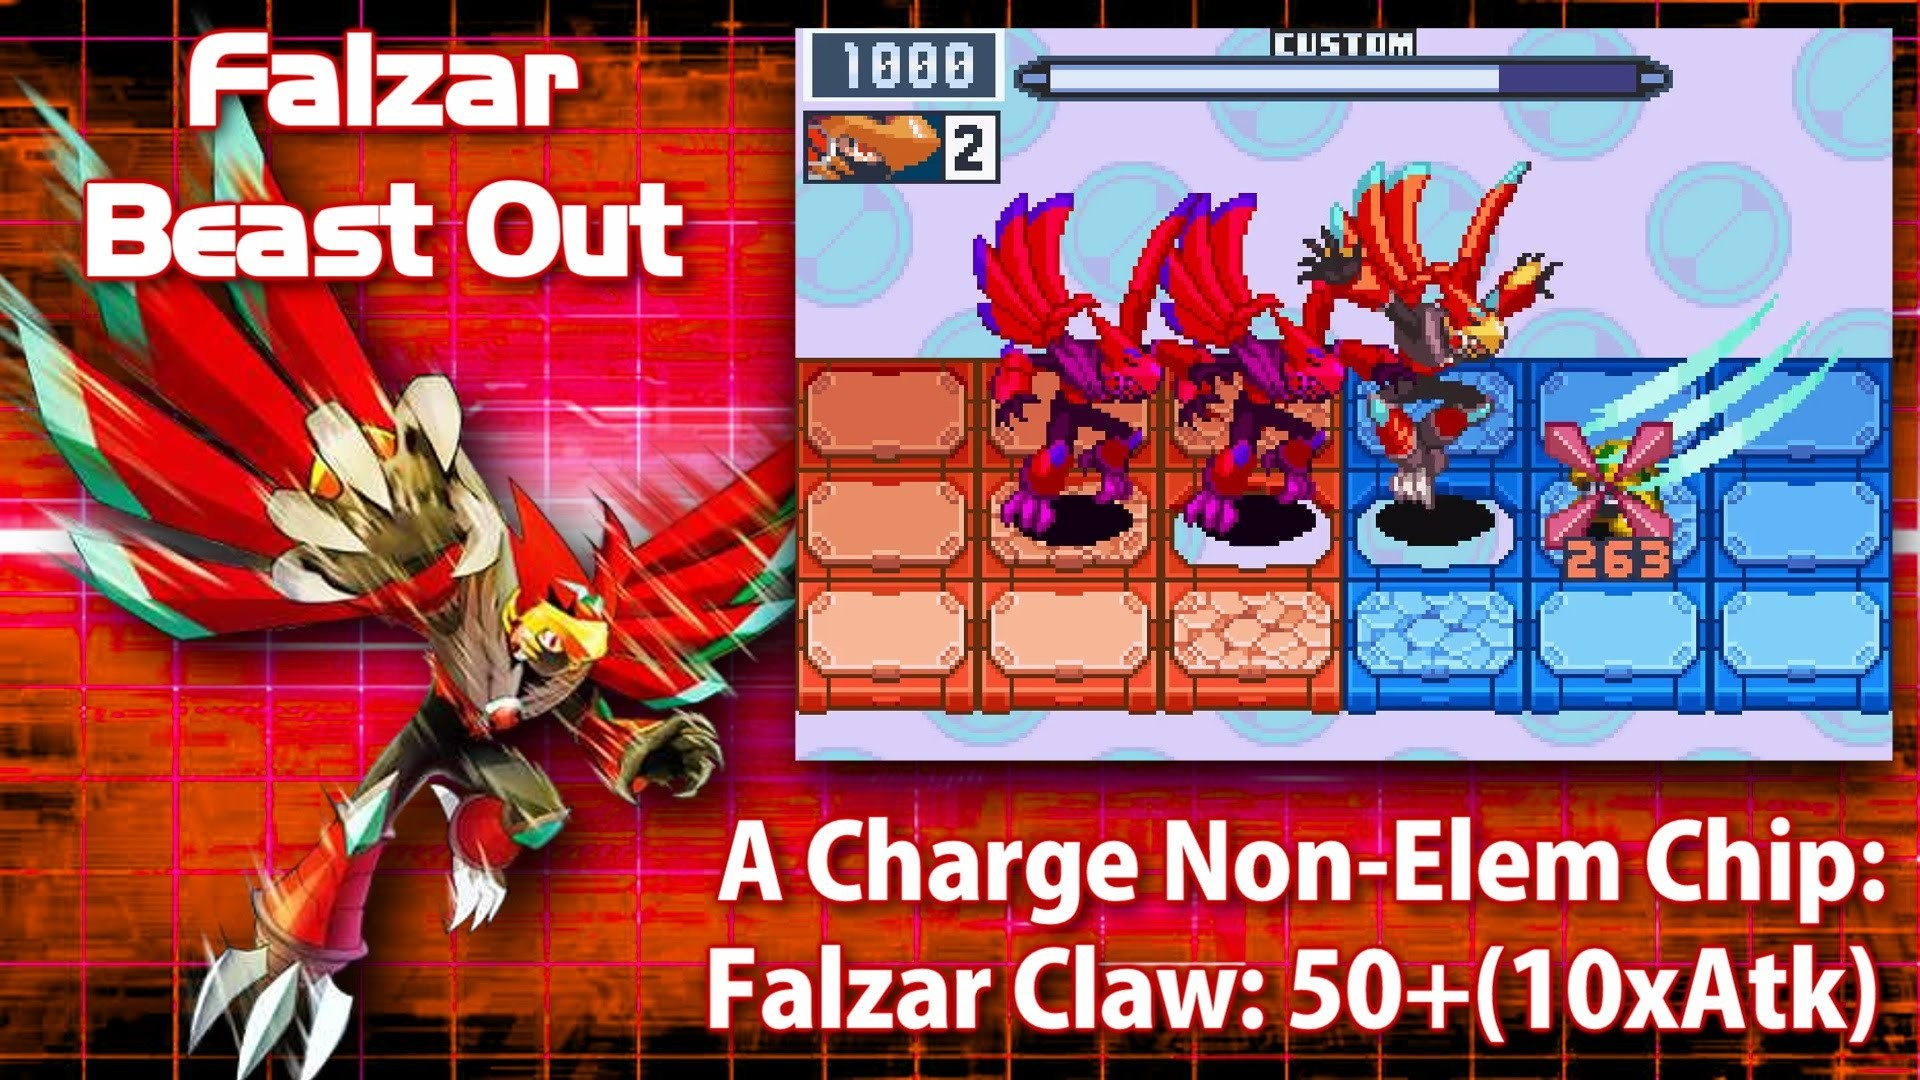 Mega Man Battle Network 6: Falzar Crosses & Beasts in 3 Minutes – YouTube